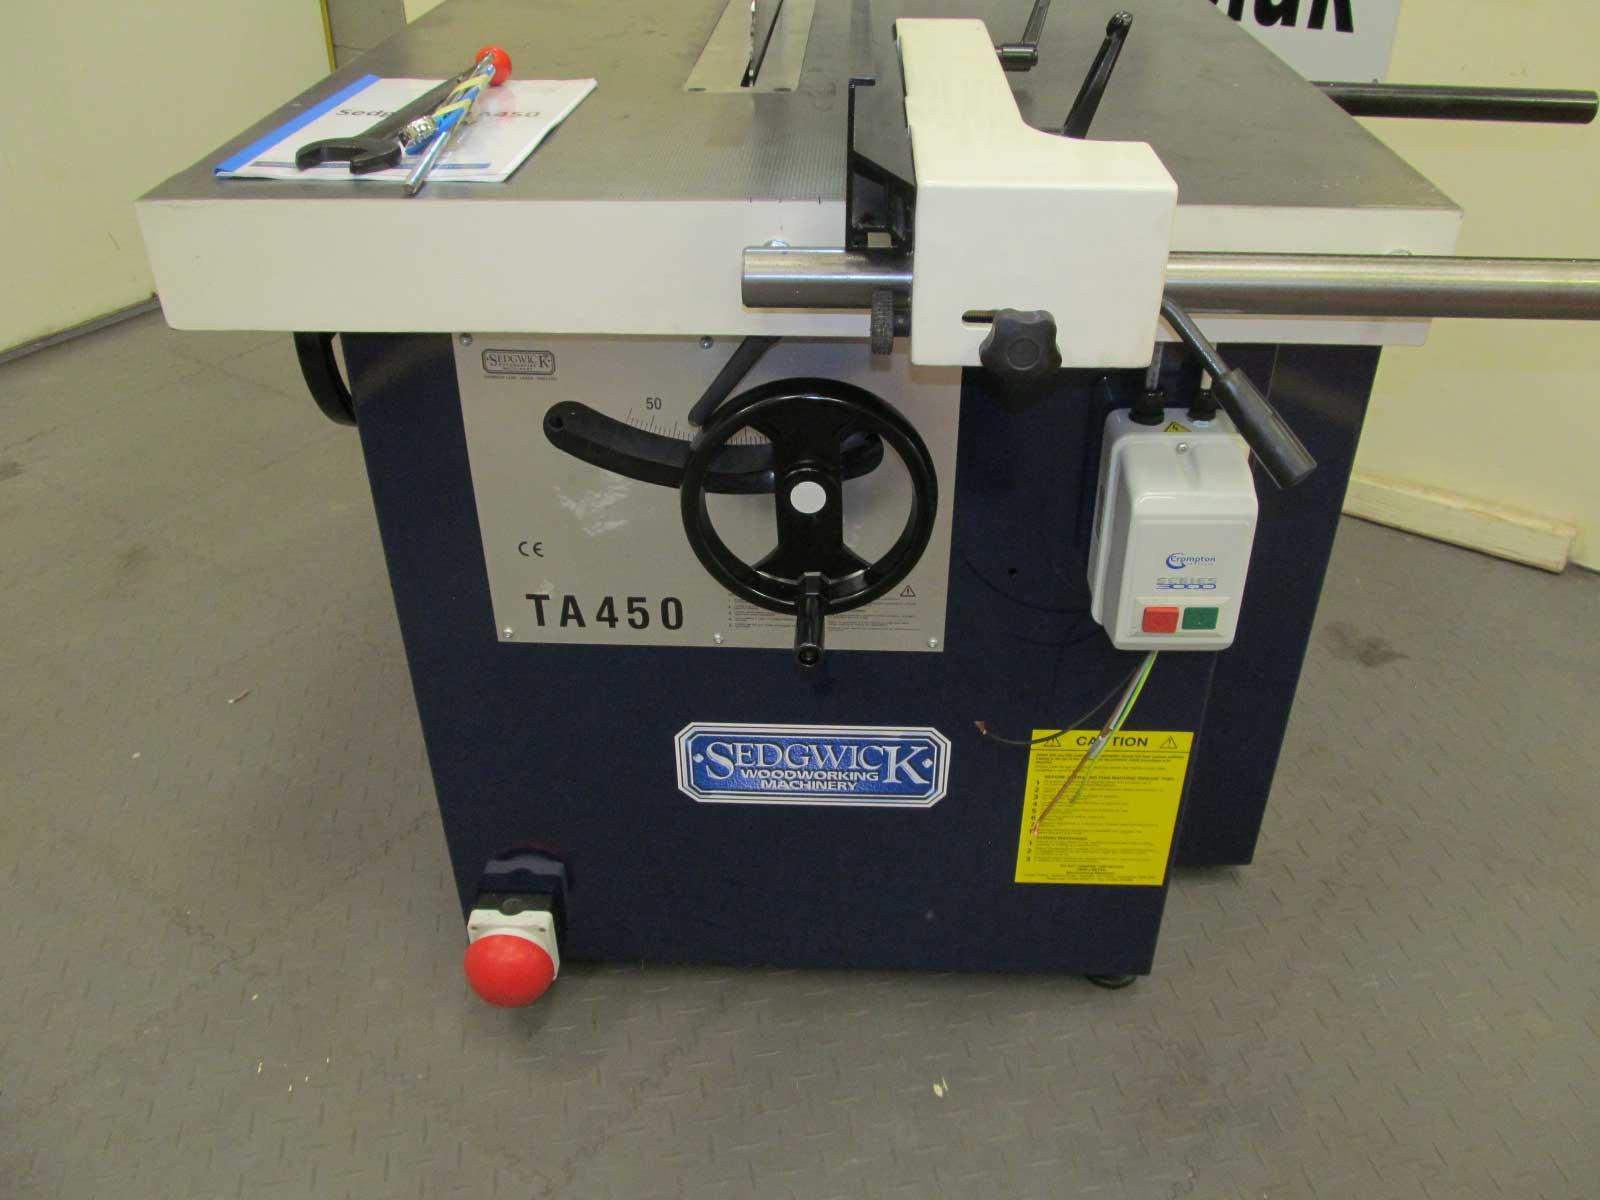 Sedgwick Ta450 Sawbench Woodworking Cnc Classical Machinery